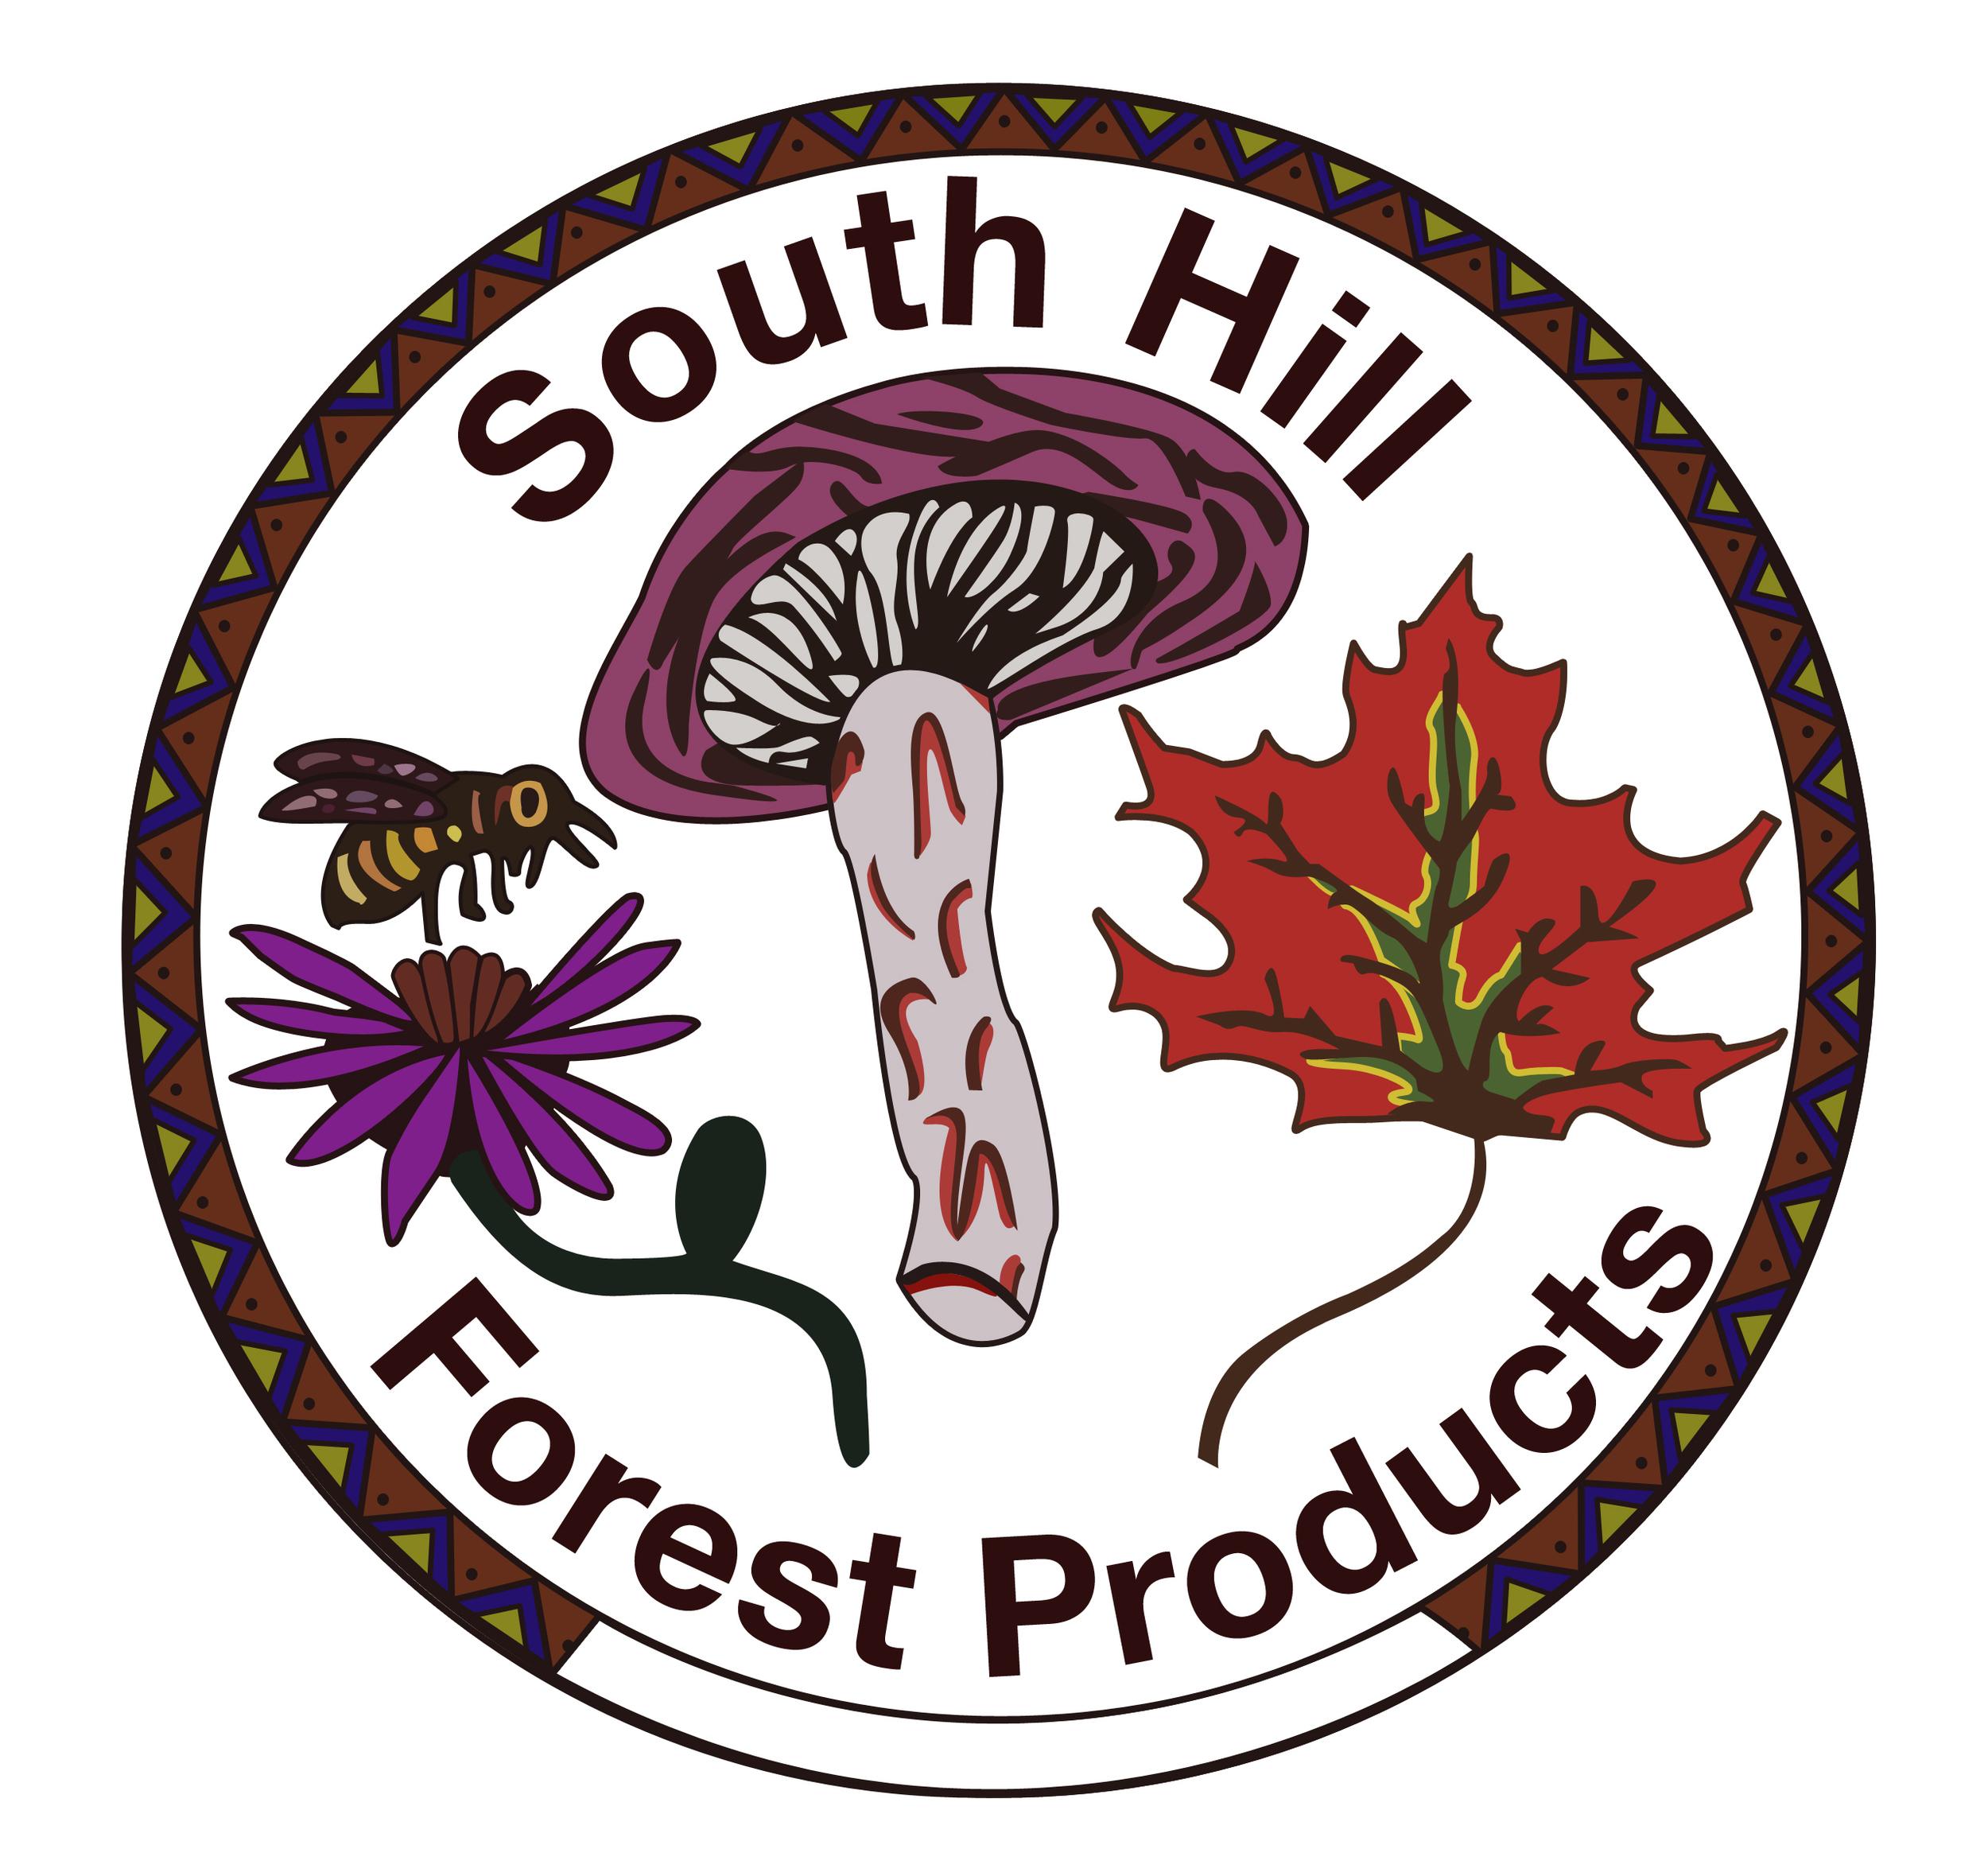 south hill logo 2.jpg